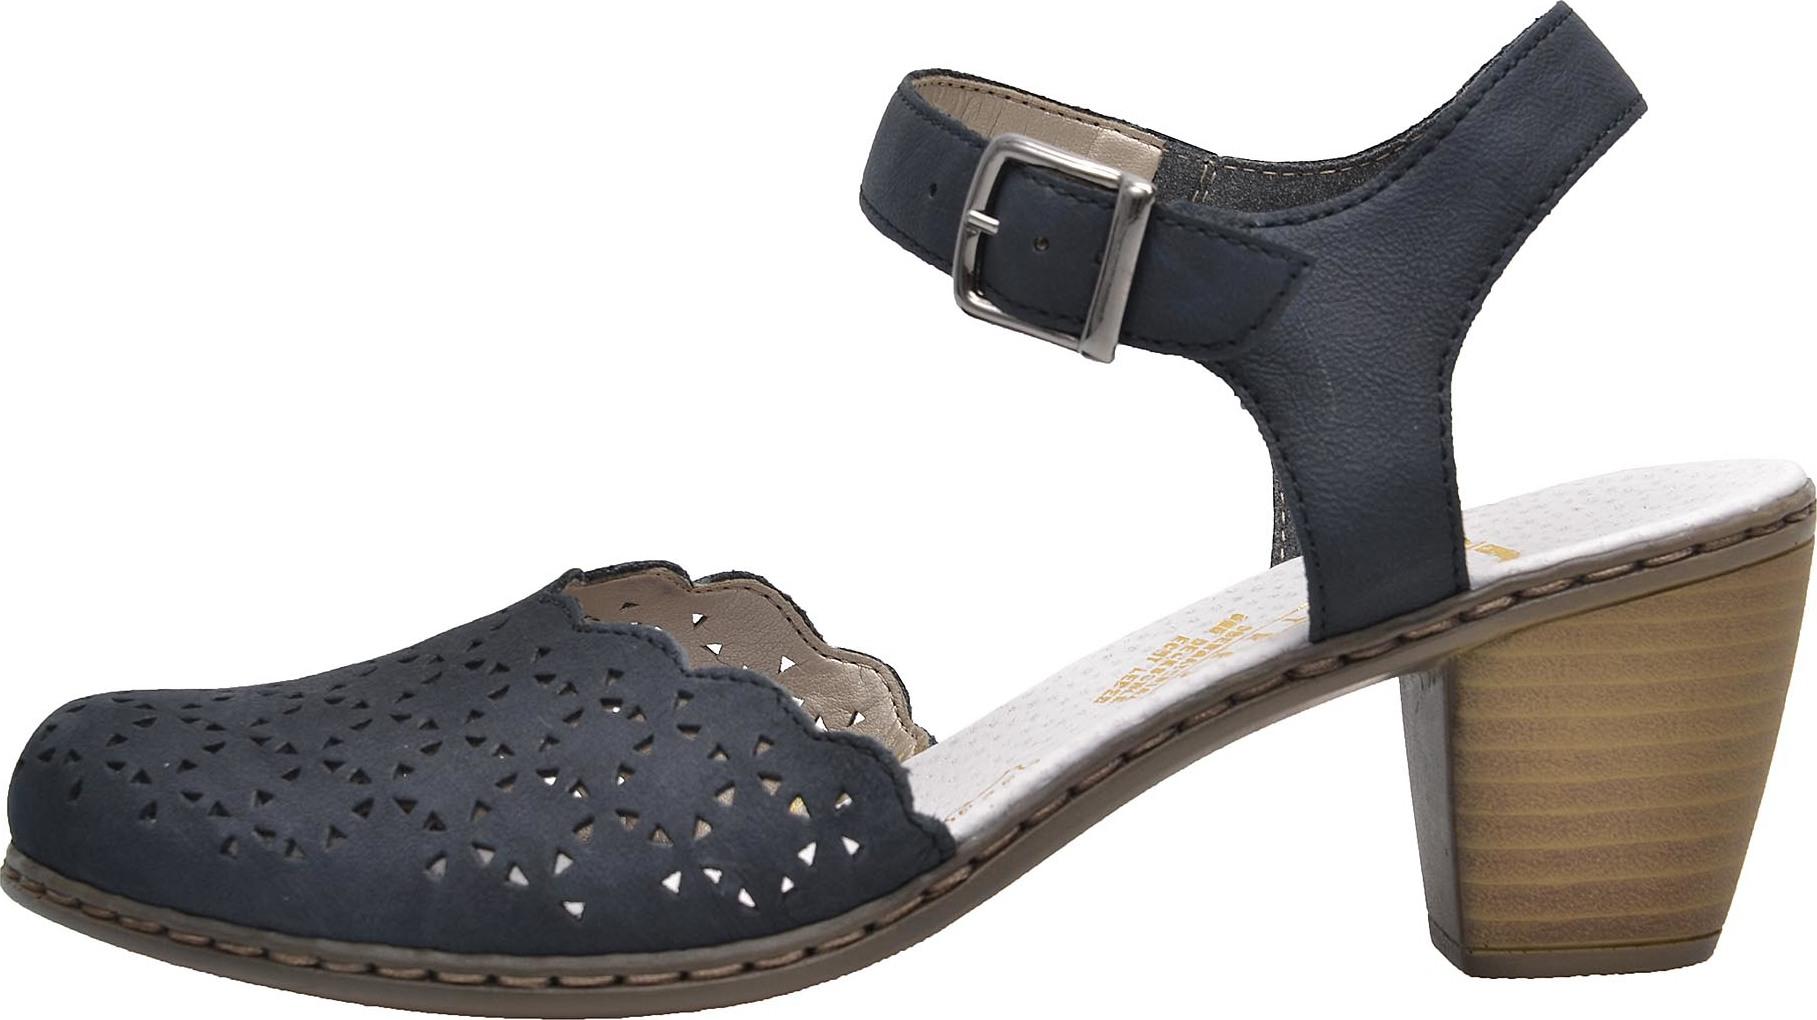 34898482c8ca Dámská obuv RIEKER 40972 14 BLAU F S 8 – Rieker Antistress